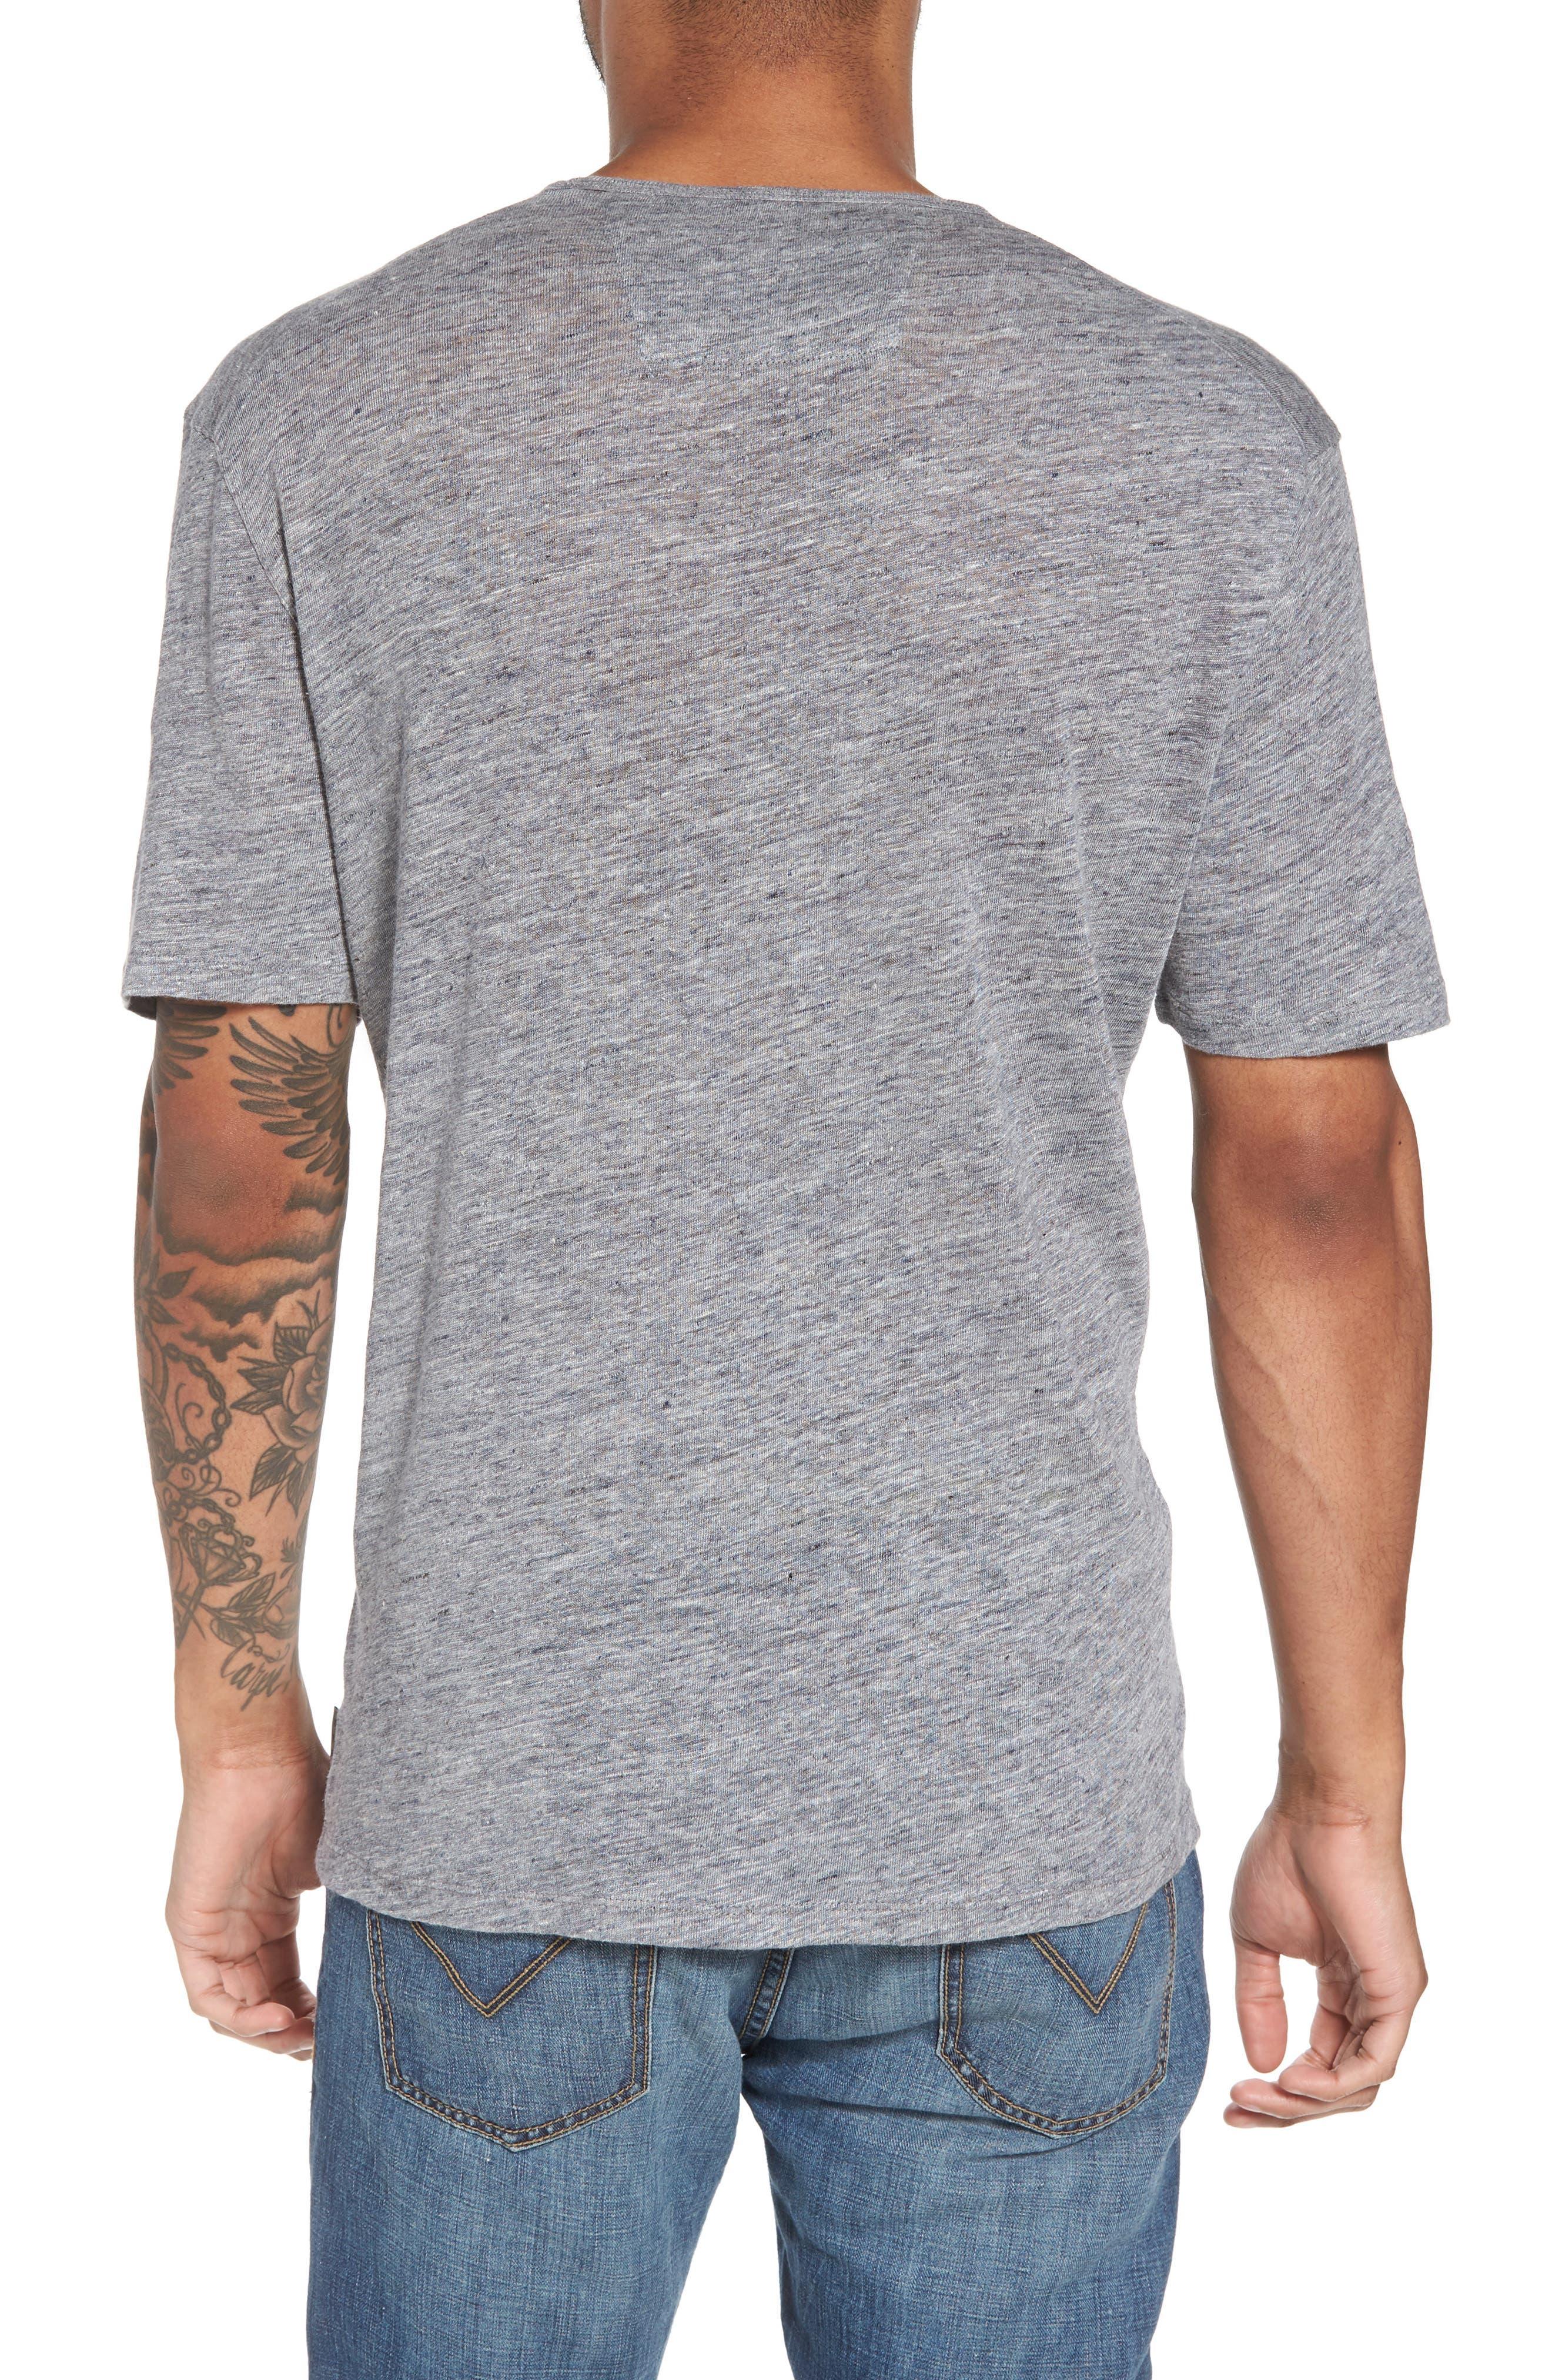 John Varvatos Crewneck Linen T-Shirt,                             Alternate thumbnail 2, color,                             Med Grey